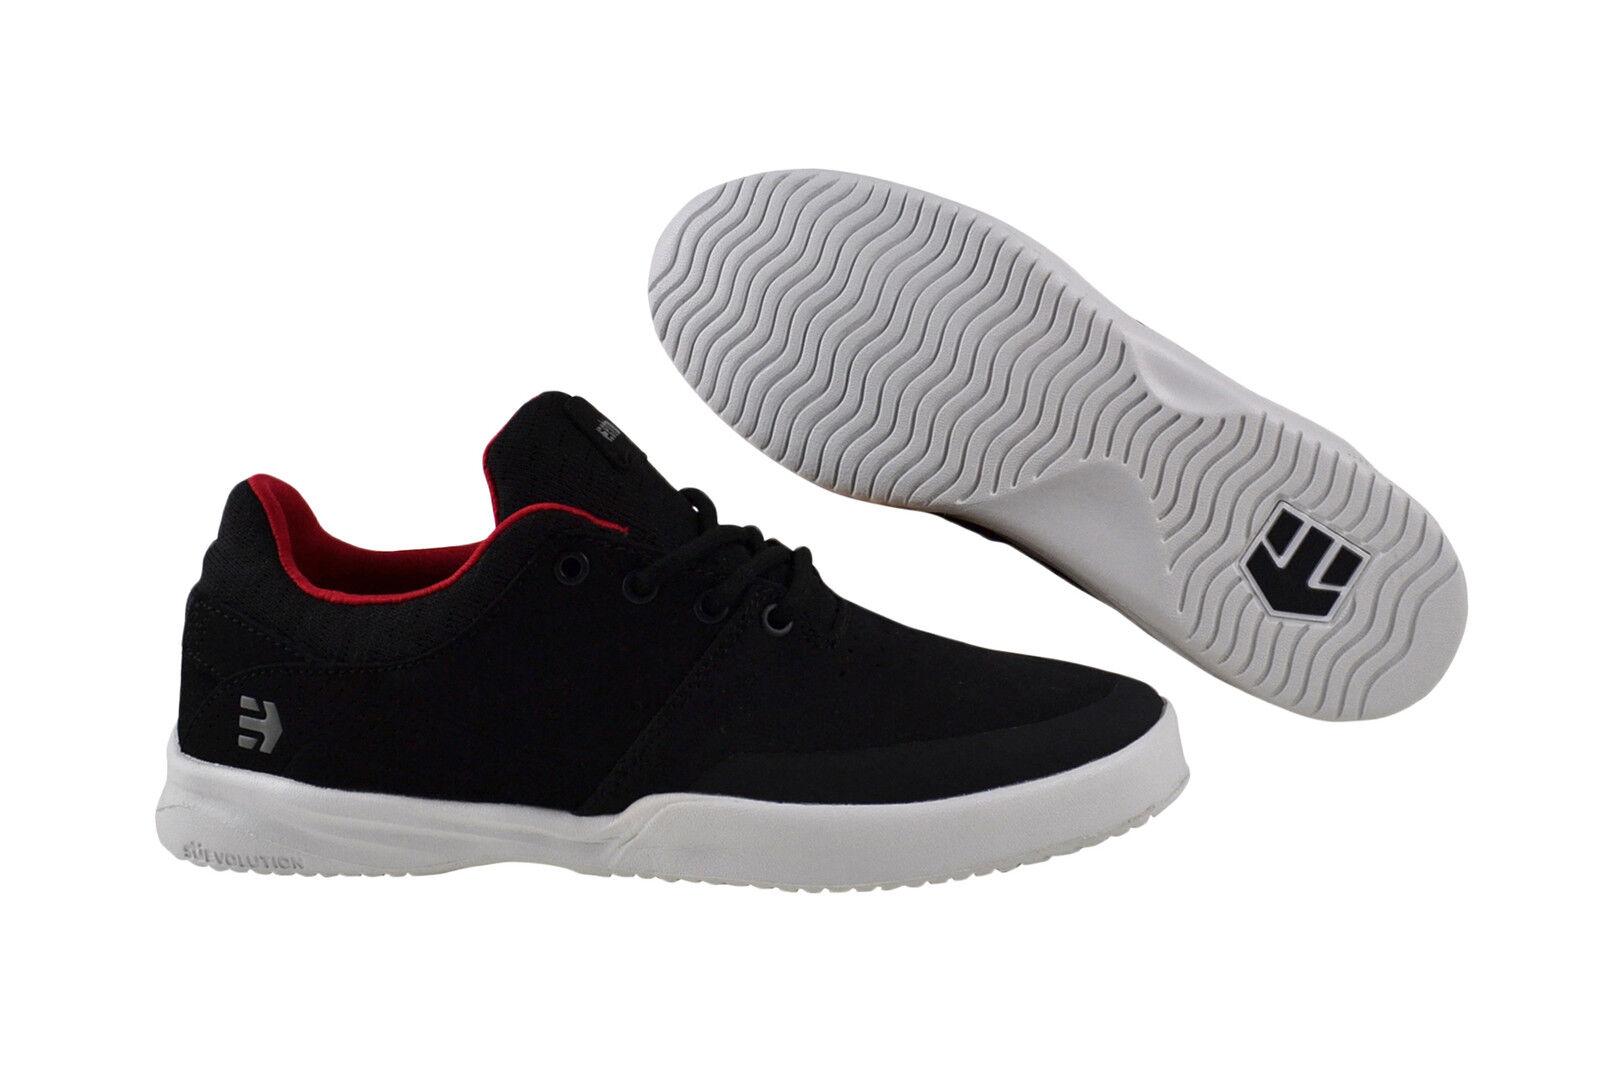 Etnies Highlite schwarz Skater Turnschuhe Schuhe schwarz